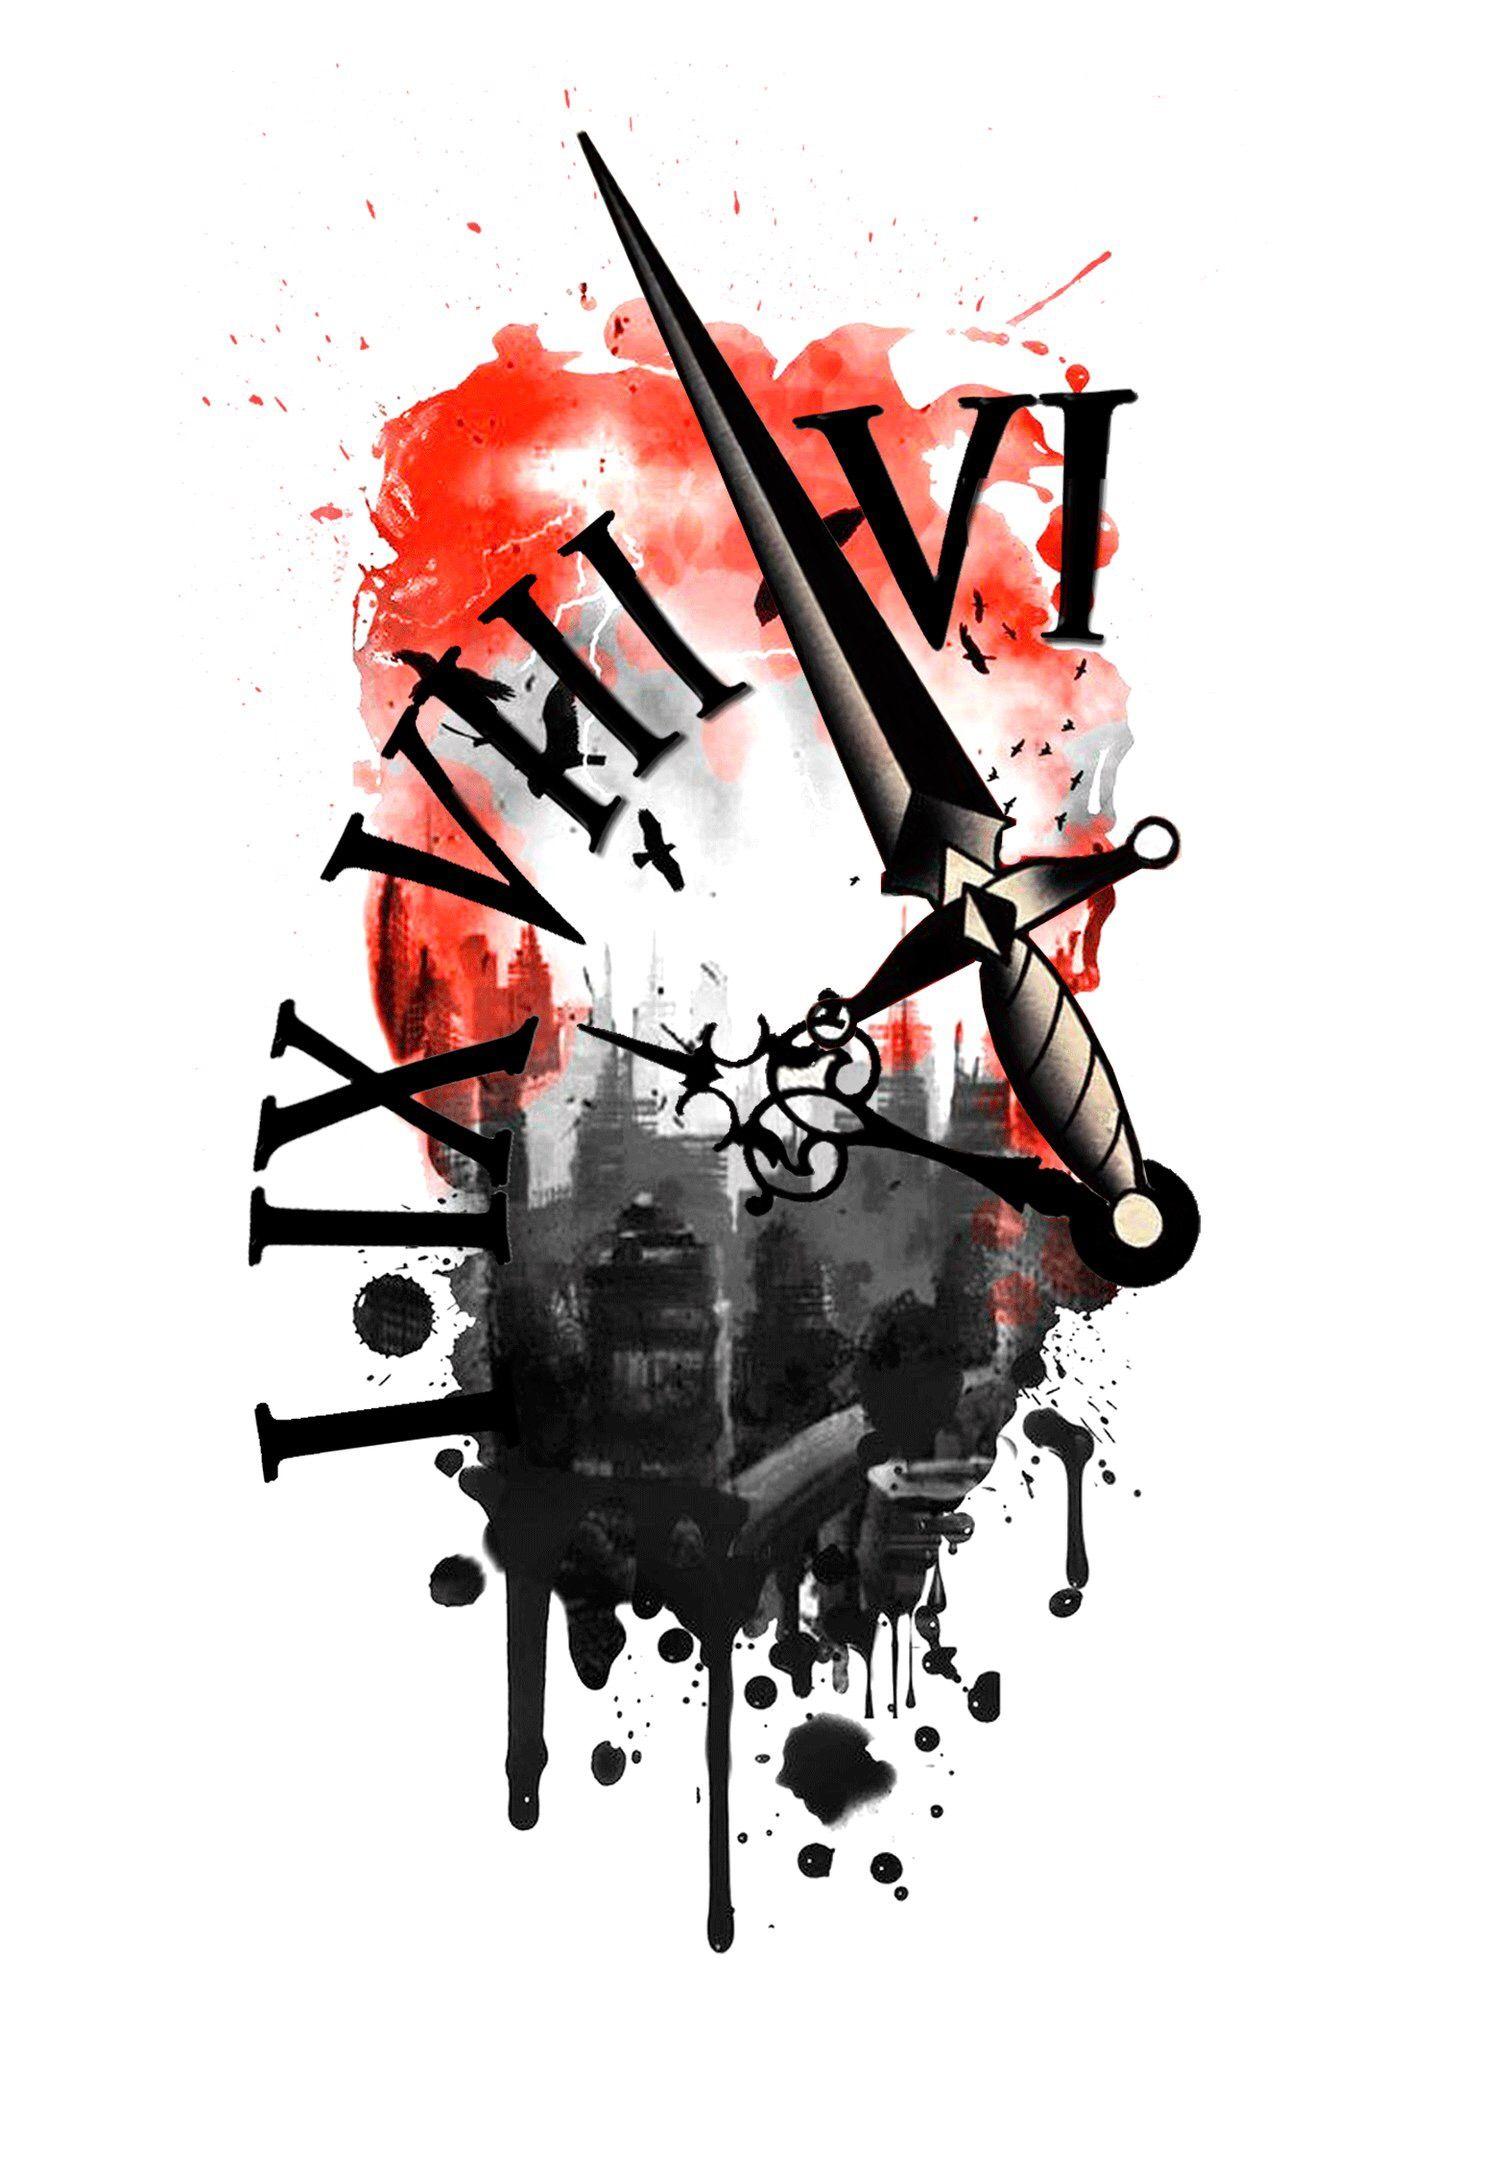 Tattoo Sketch Clocke татуировка эскиз Tattoo Sketch татуировка